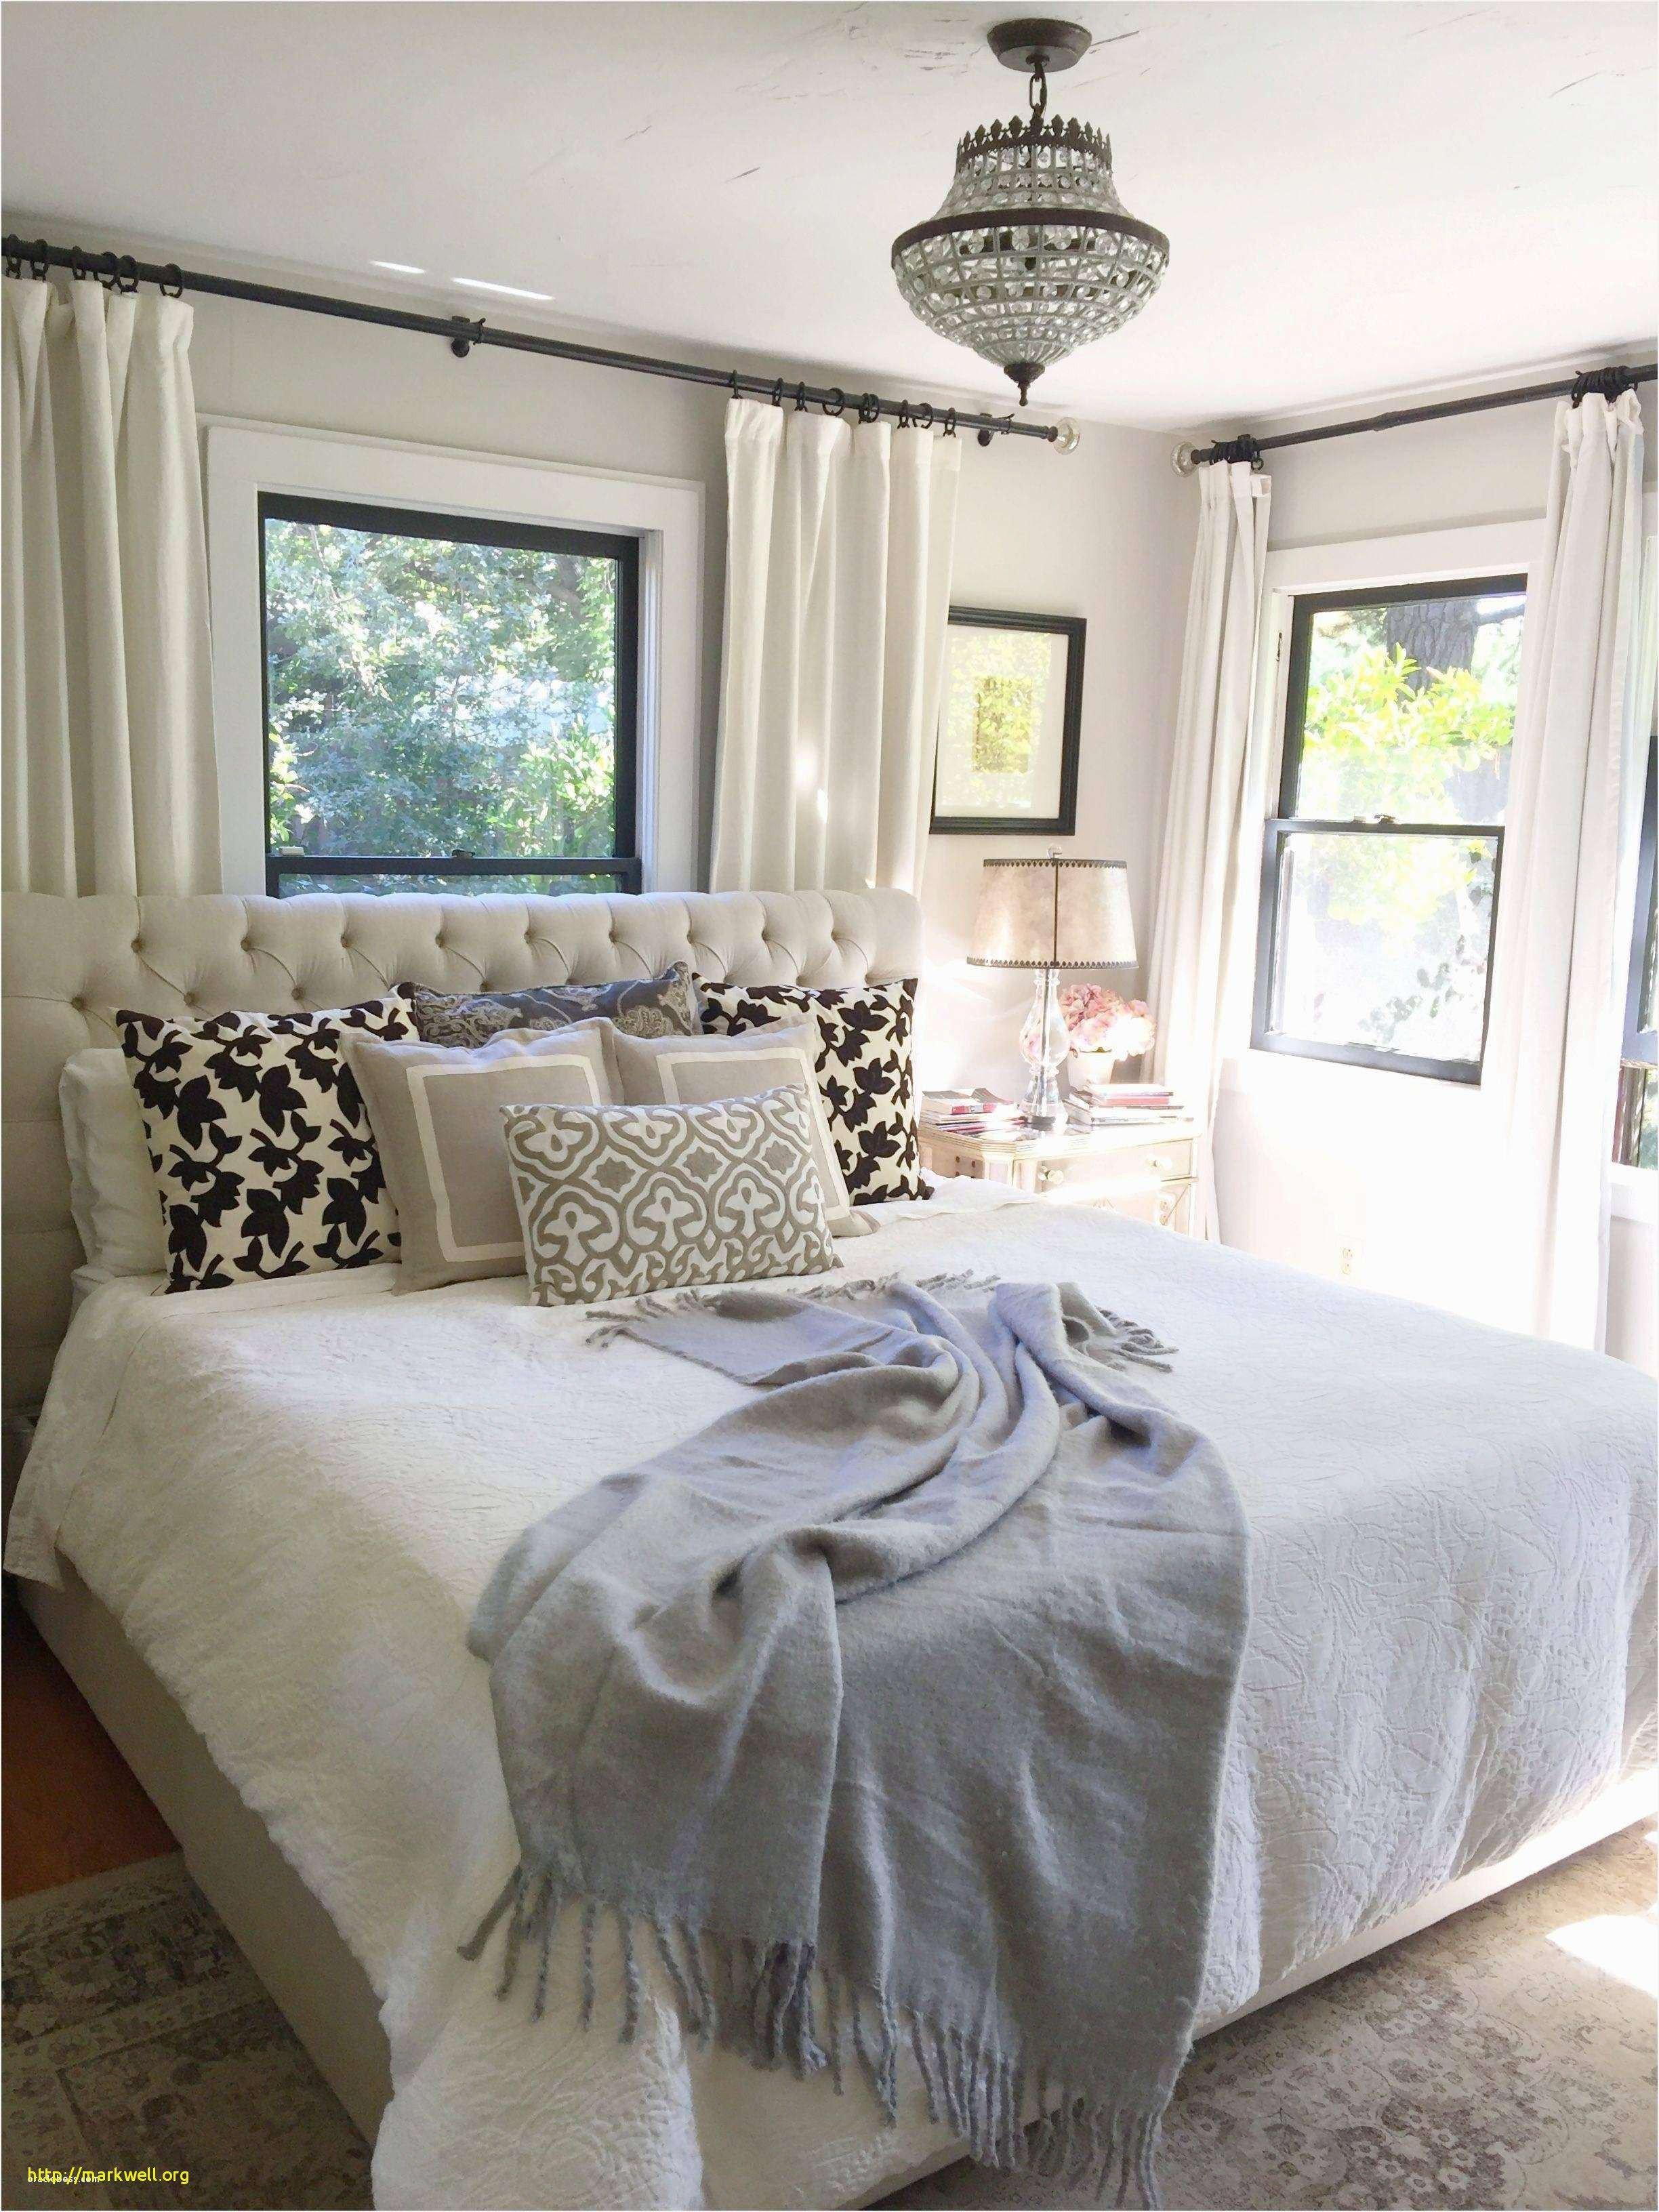 Bedroom Dressers On Sale Best Of Beautiful White Bedroom Chair